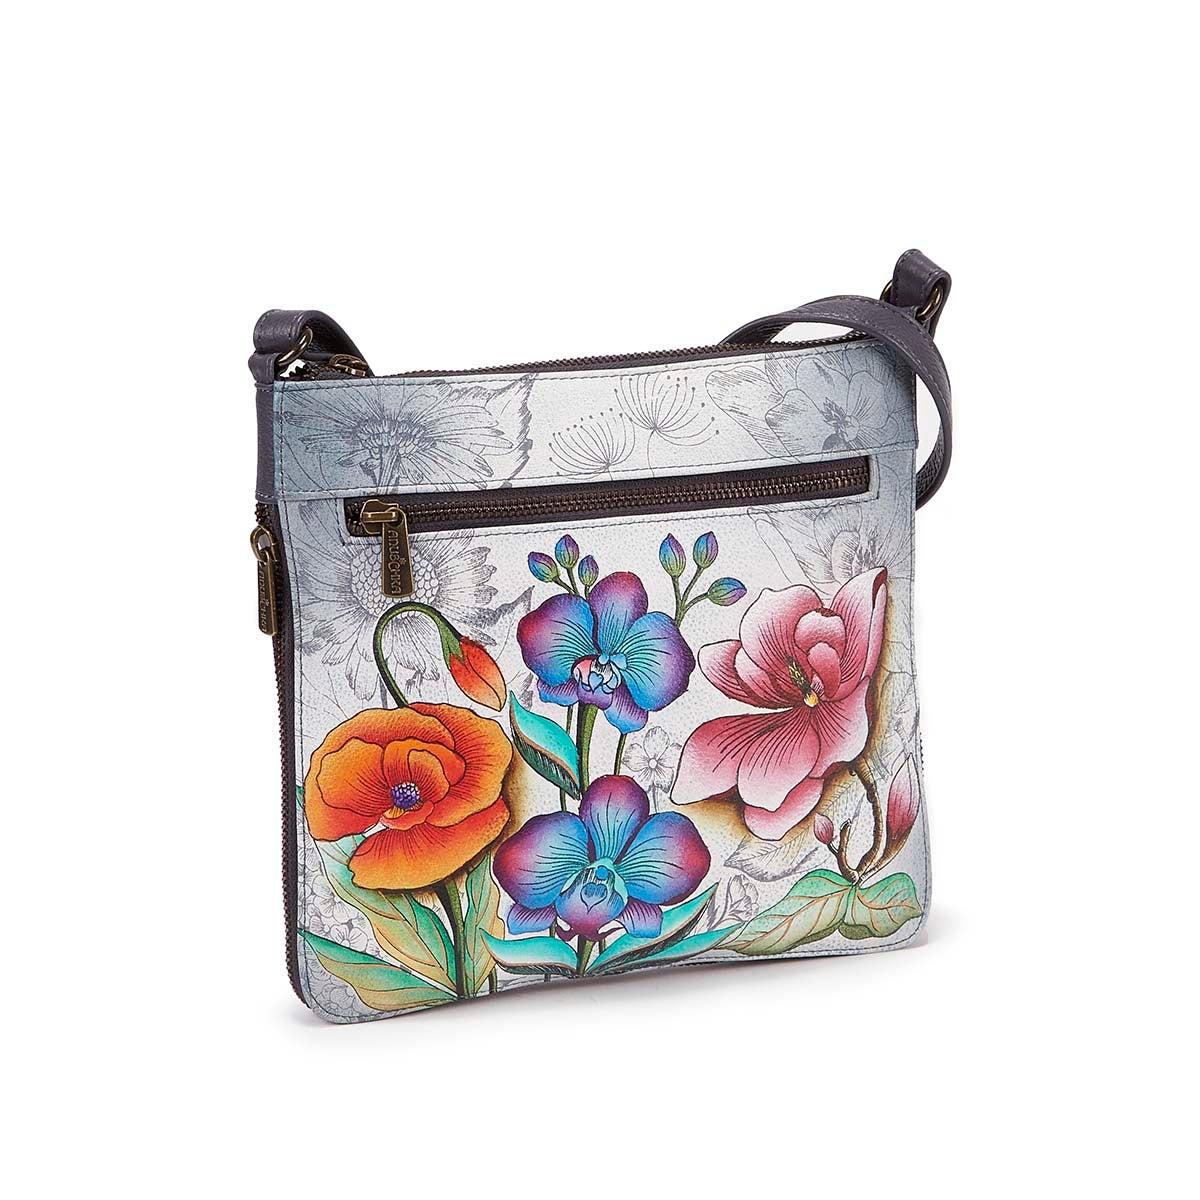 Printed lthr FloralFantasy crossbody bag